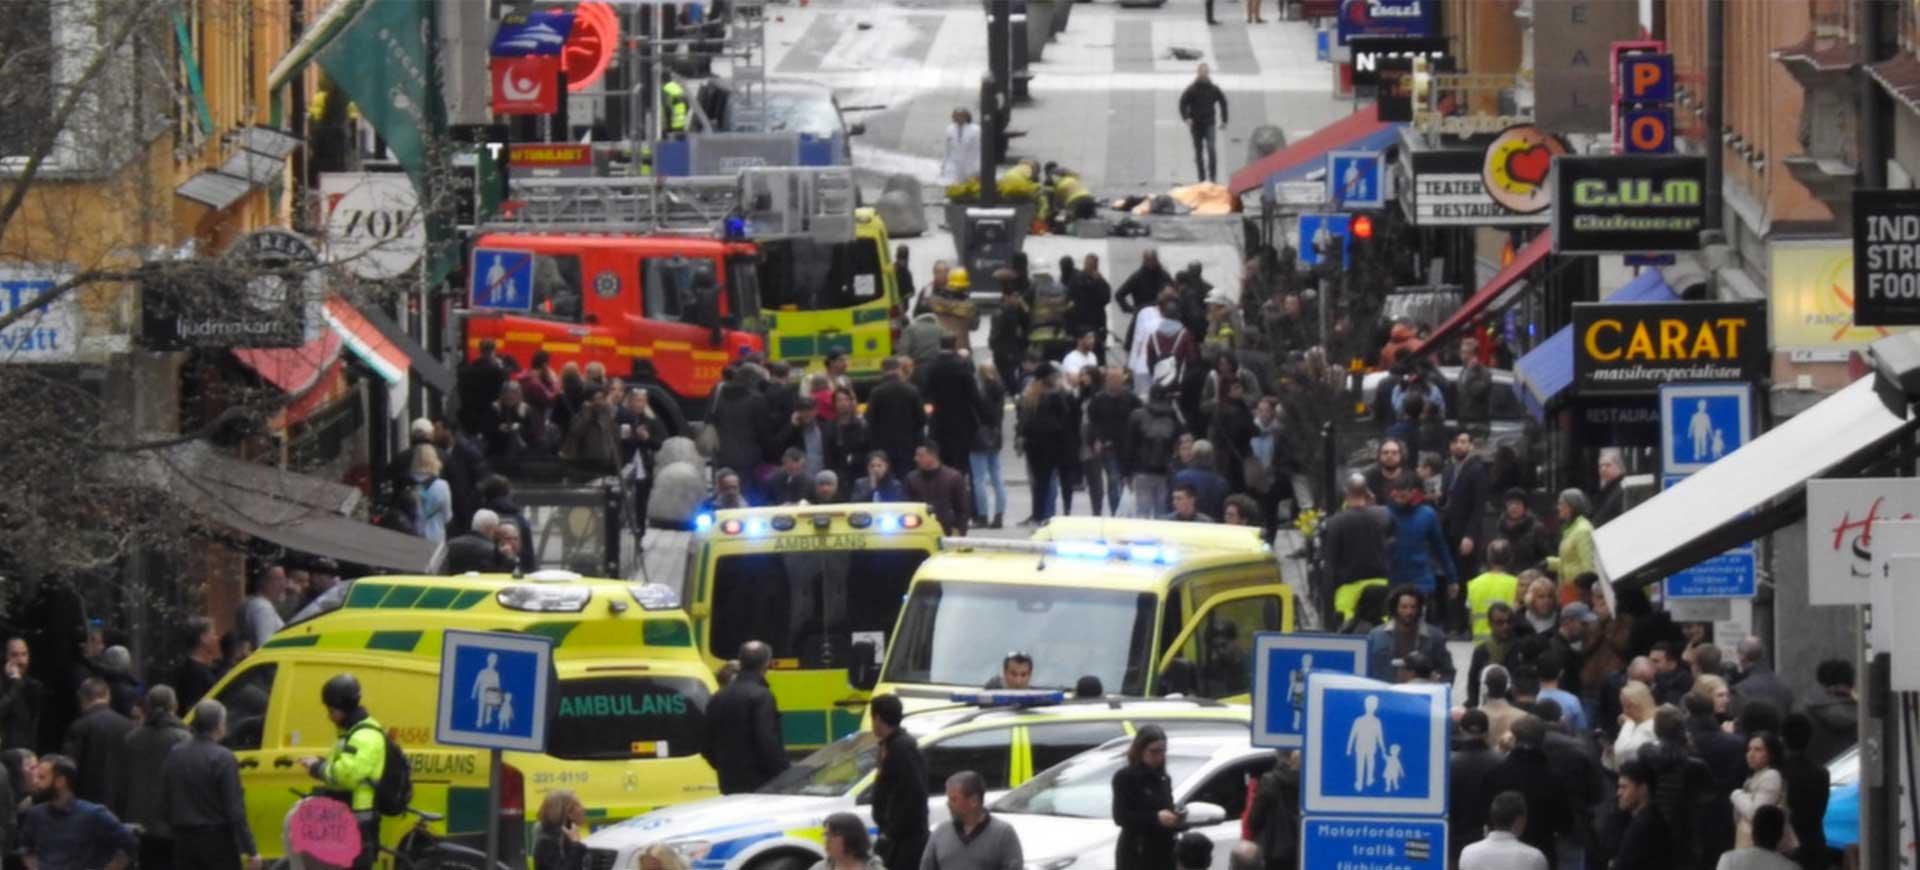 stockholm terror lastbil